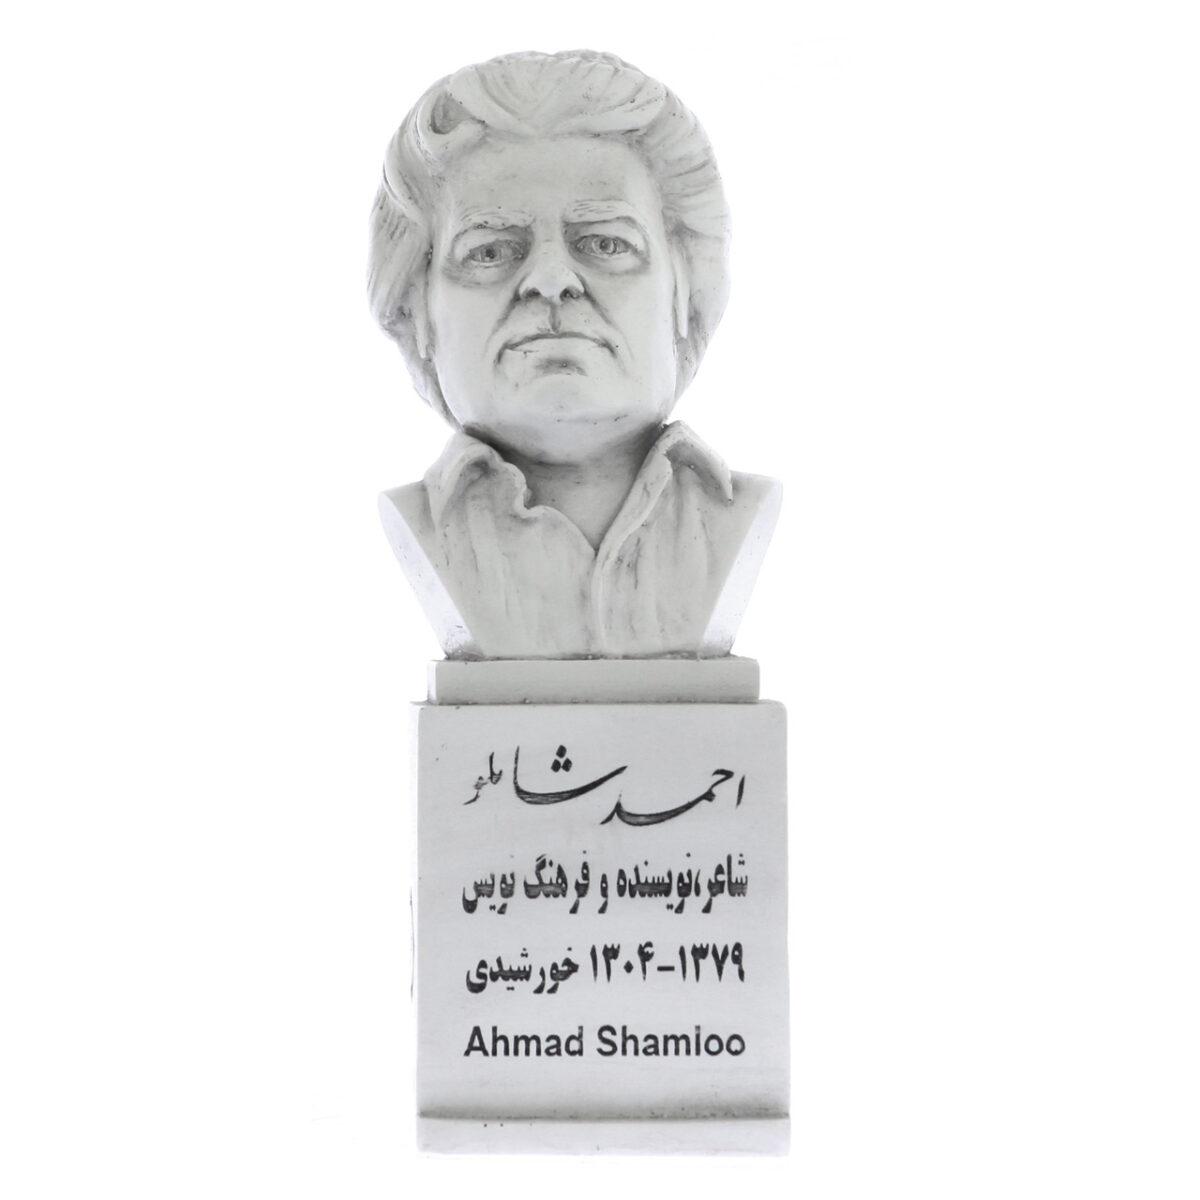 shamloo s 1200x1200 - سردیس استاد احمد شاملو